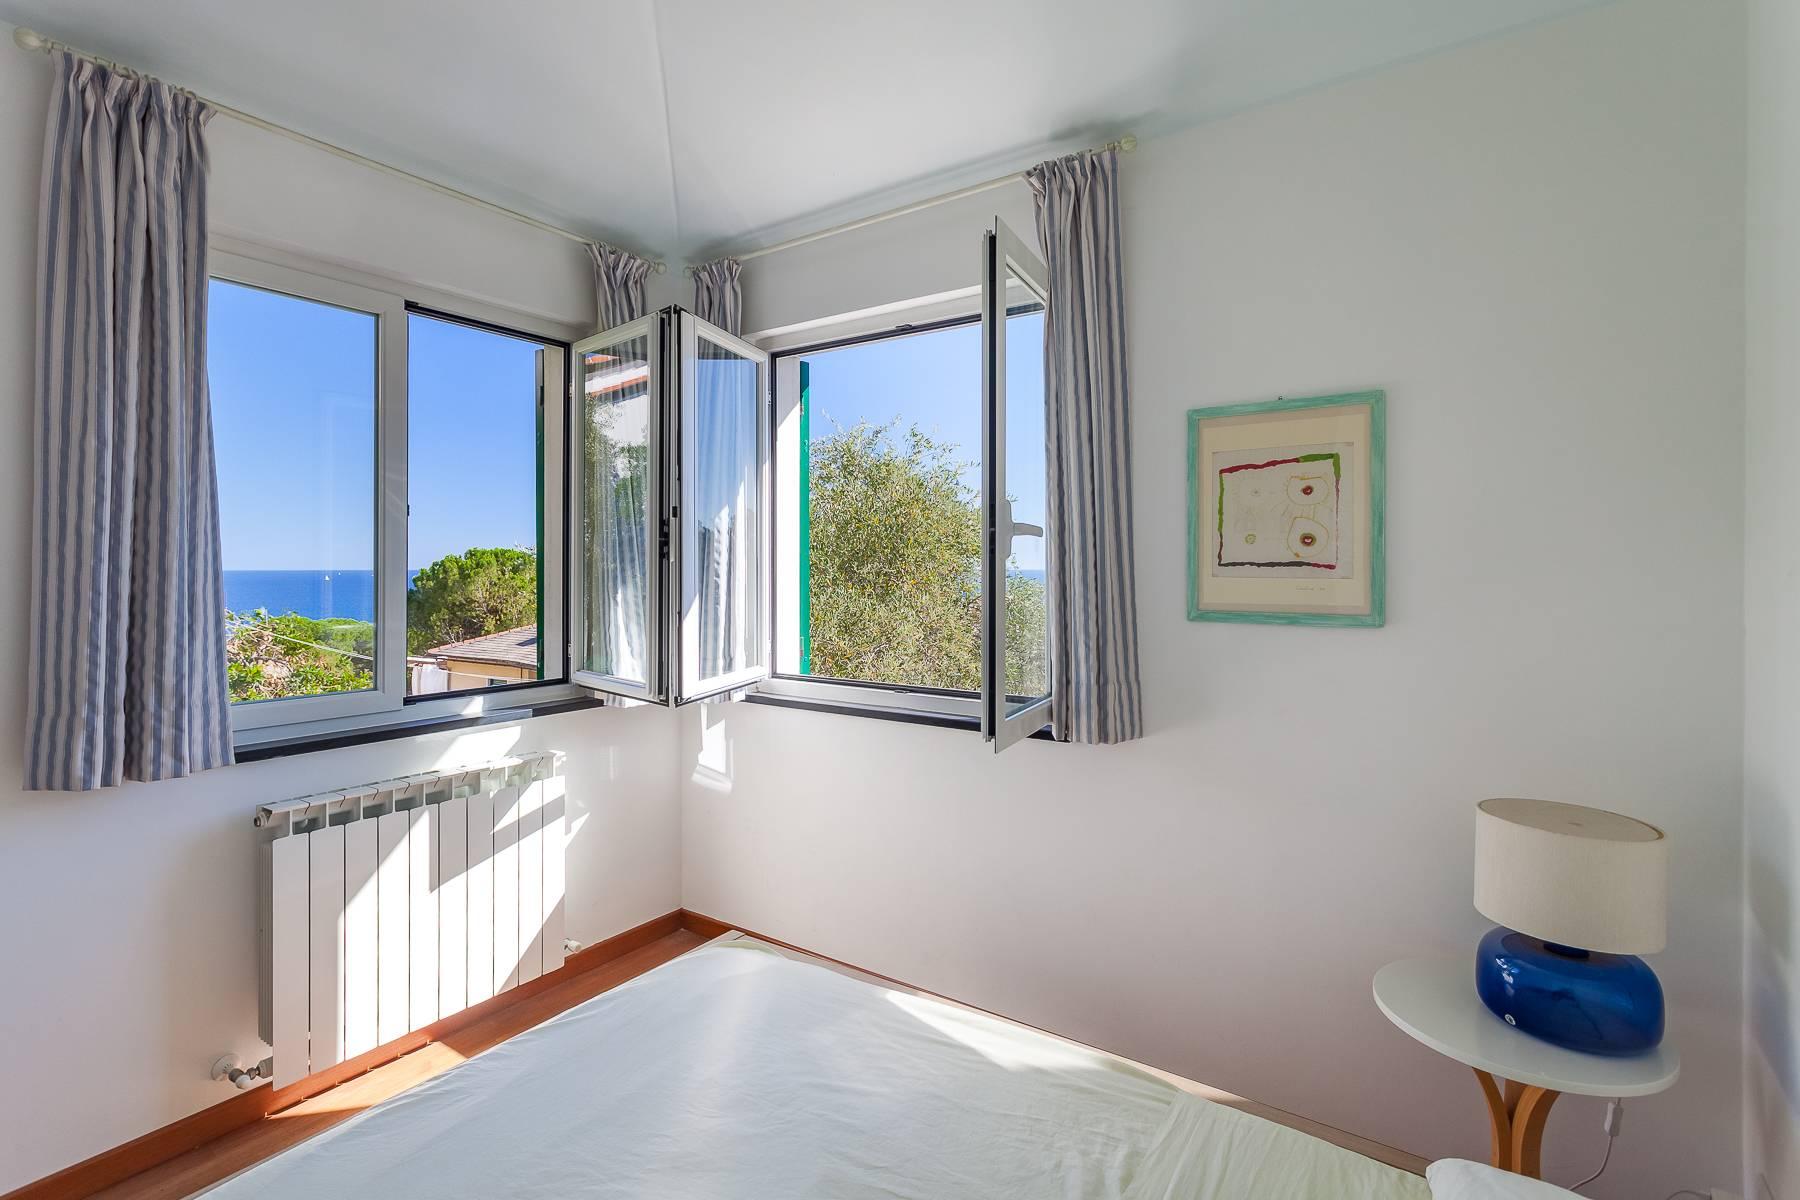 Casa indipendente in Vendita a Zoagli: 5 locali, 100 mq - Foto 27